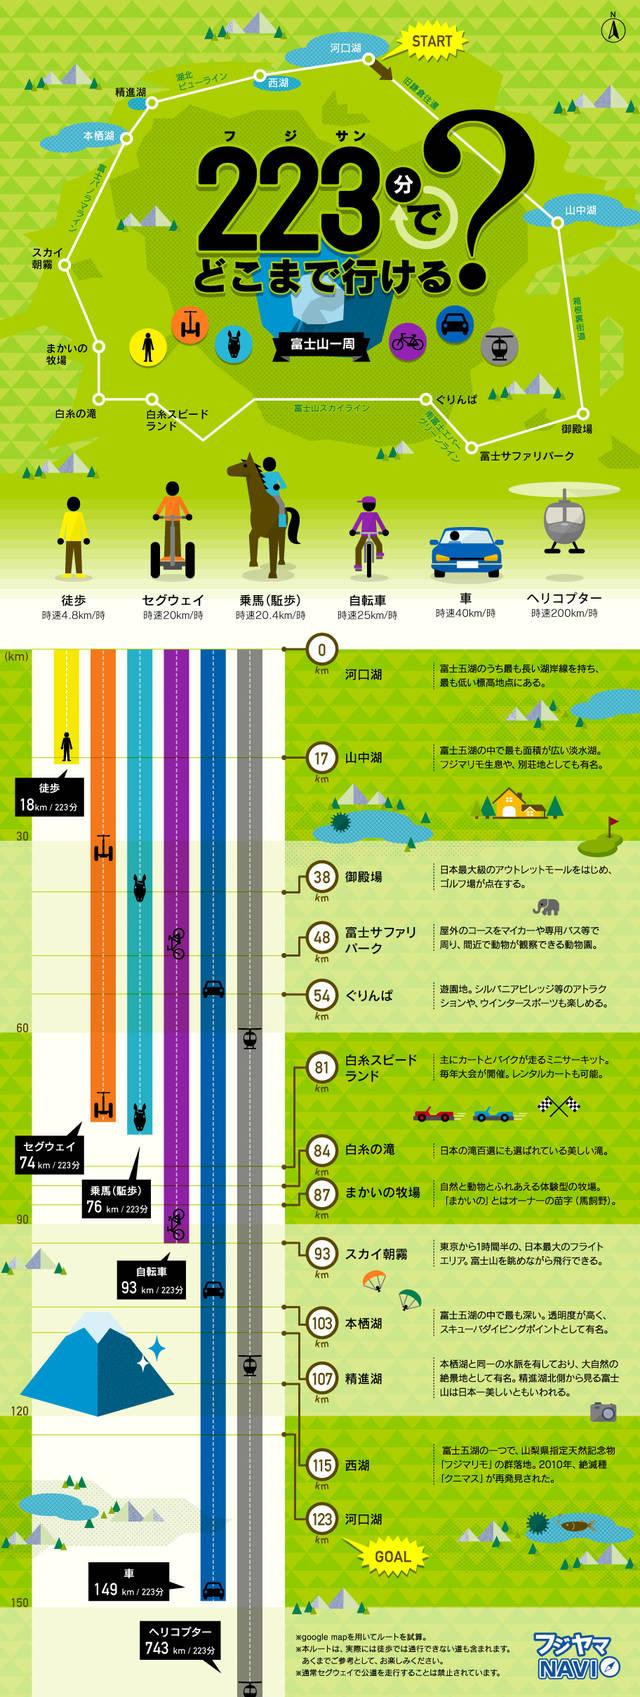 Fuji issyu11